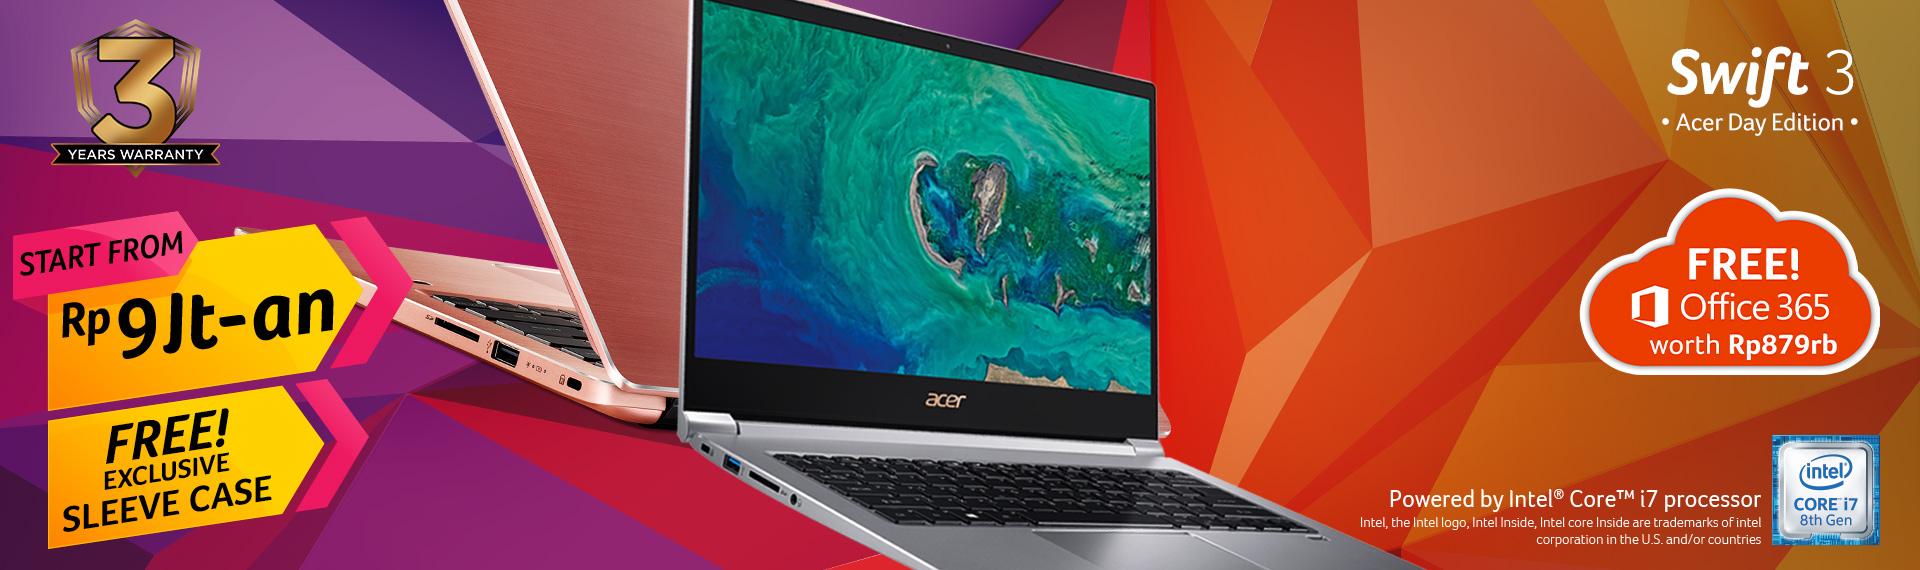 Swift 3 Acer Day Edition, Laptop Tipis Generasi Terbaru Seharga Hanya 9 Jutaan!